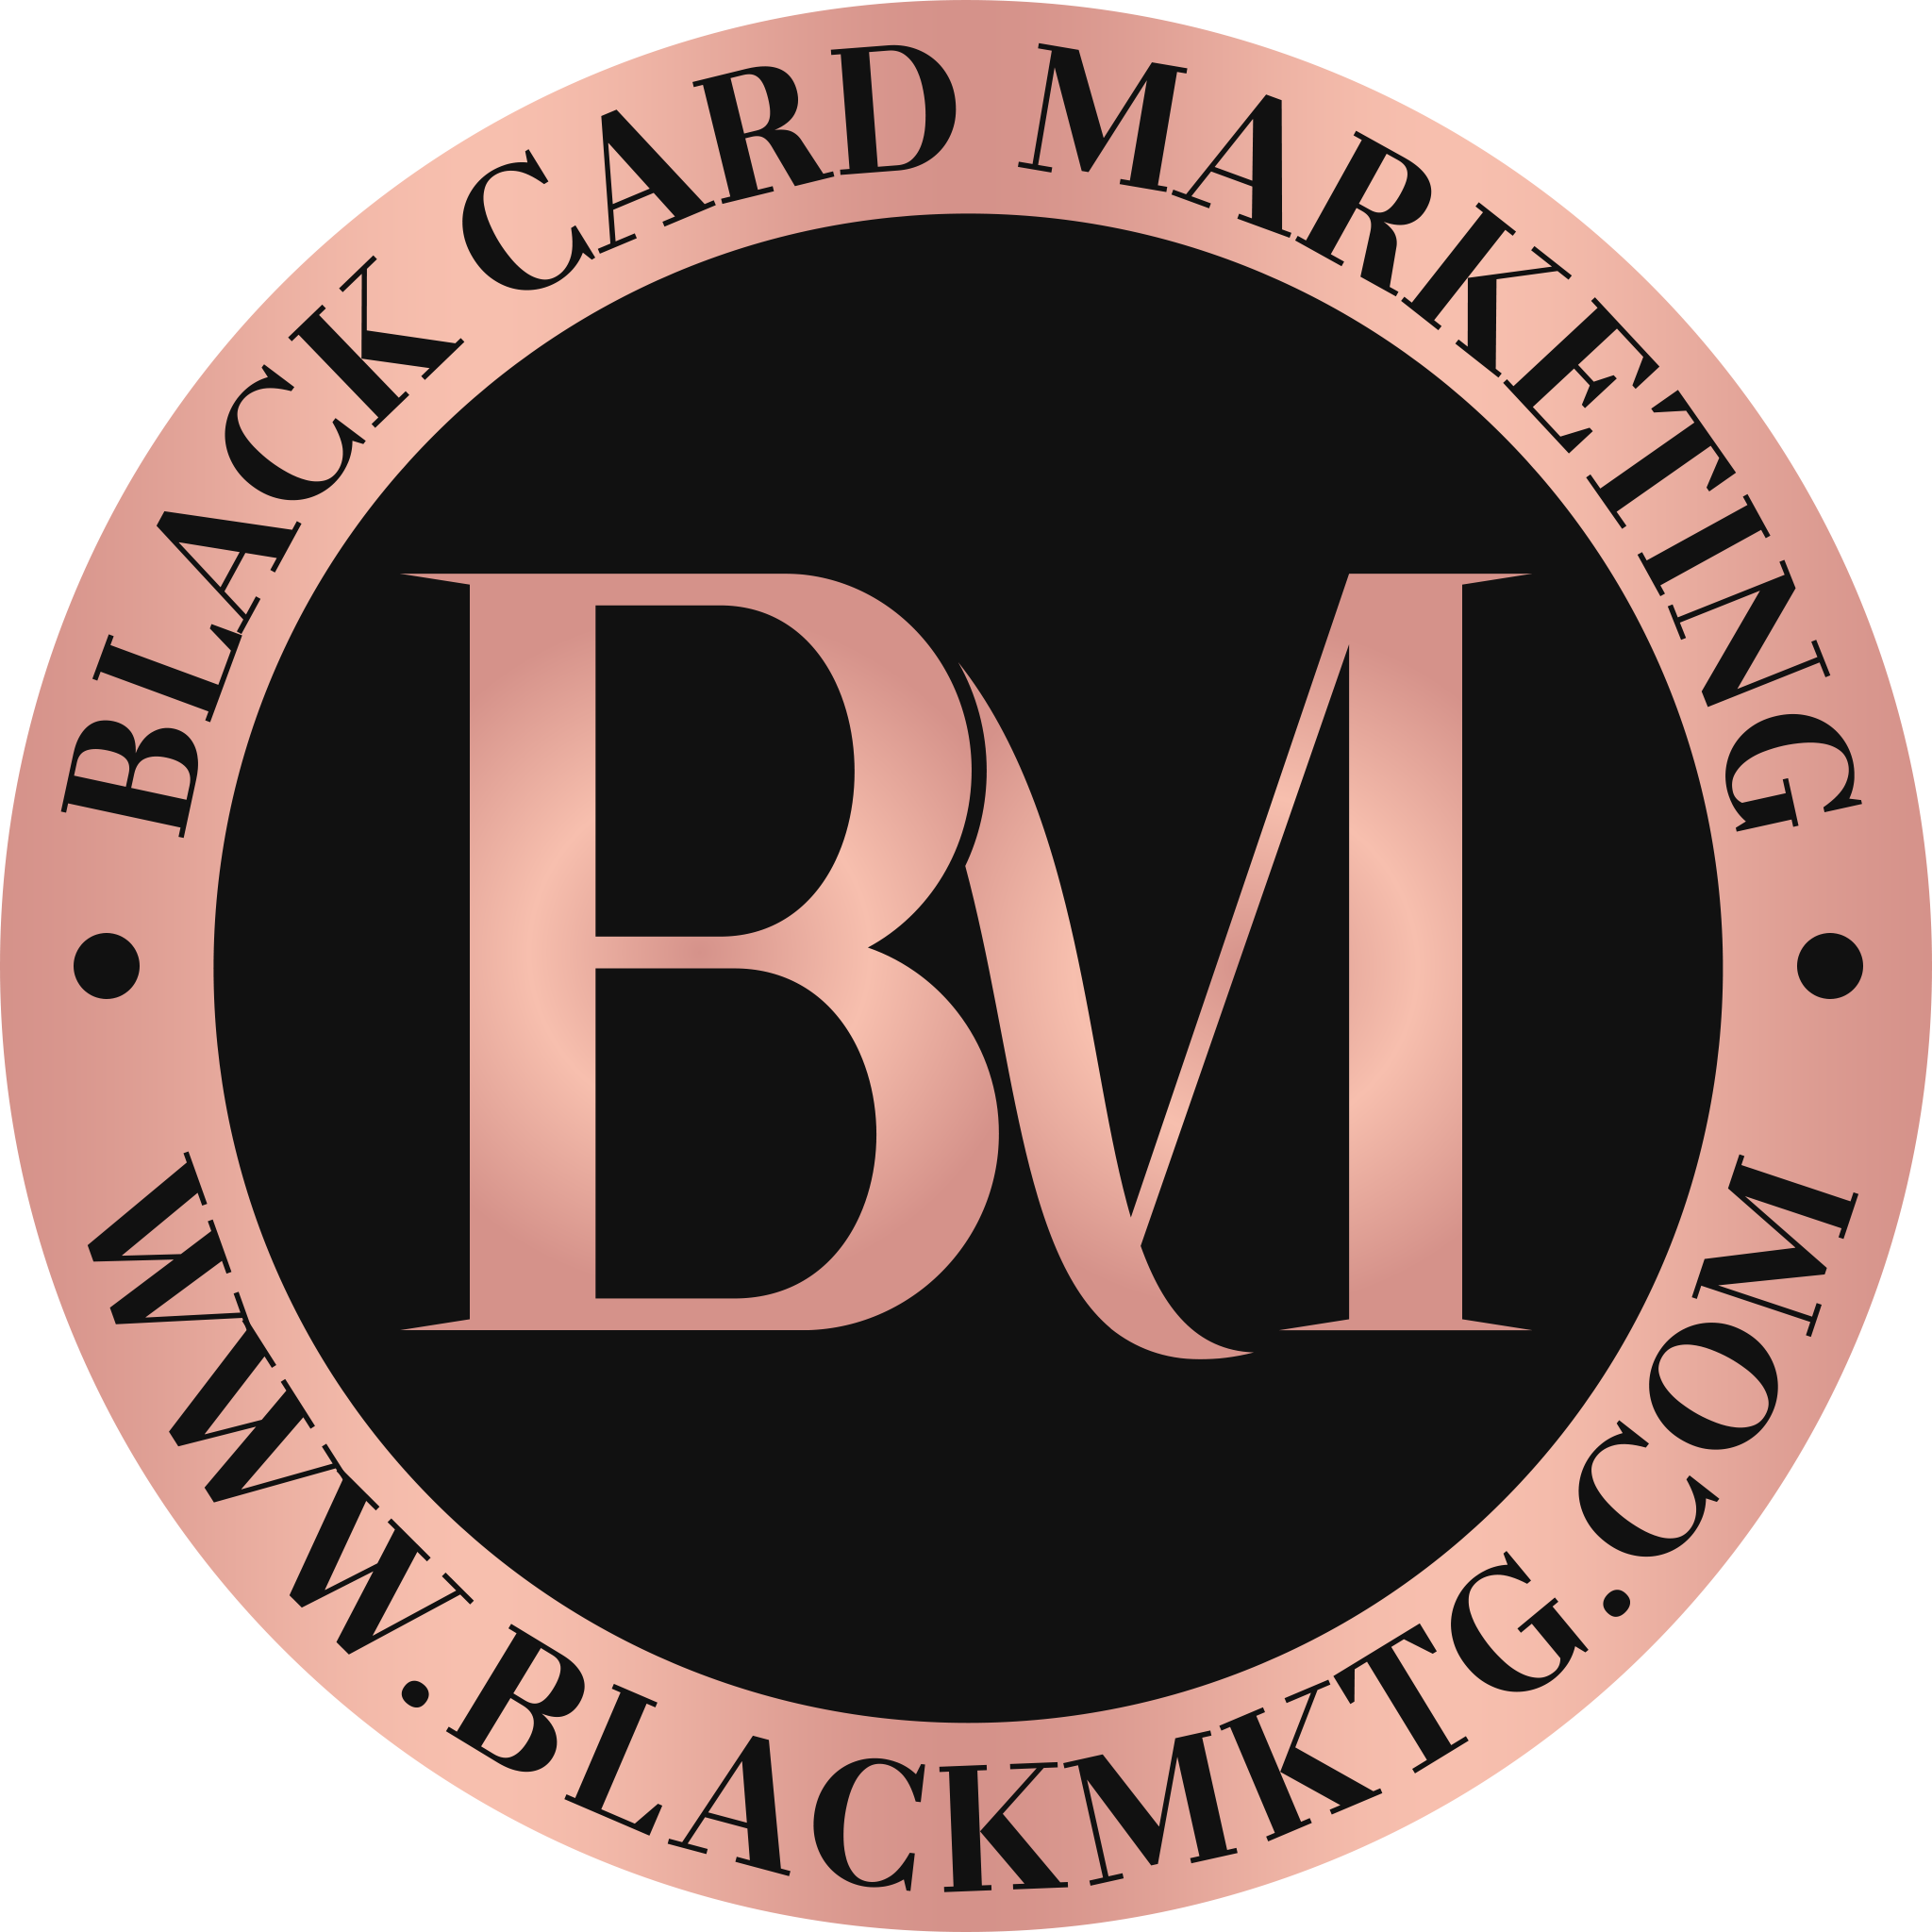 Black Card Marketing Inc.